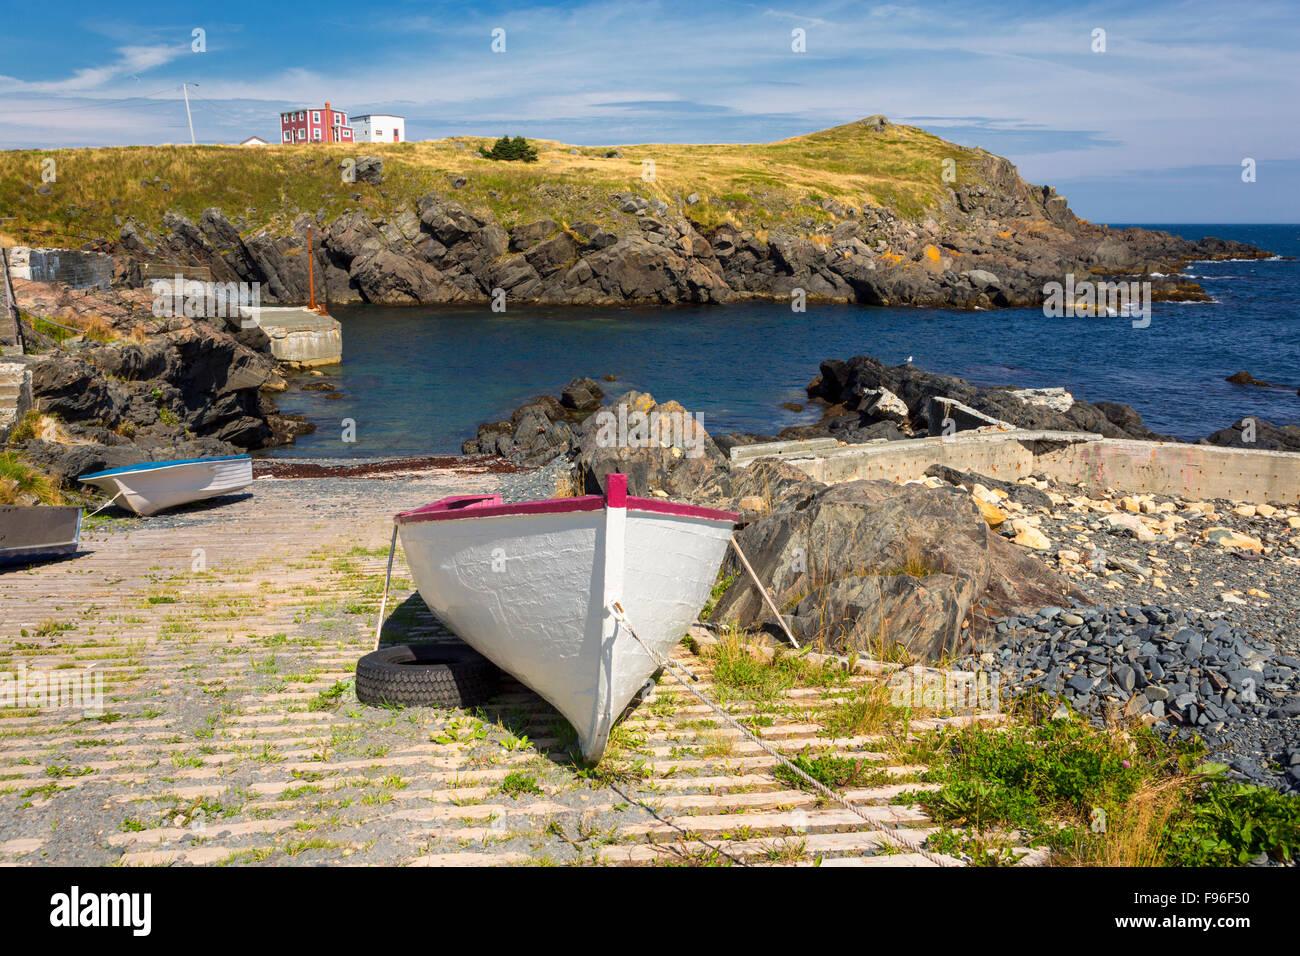 Wooden boat, Broad Cove, Newfoundland, Canada Stock Photo